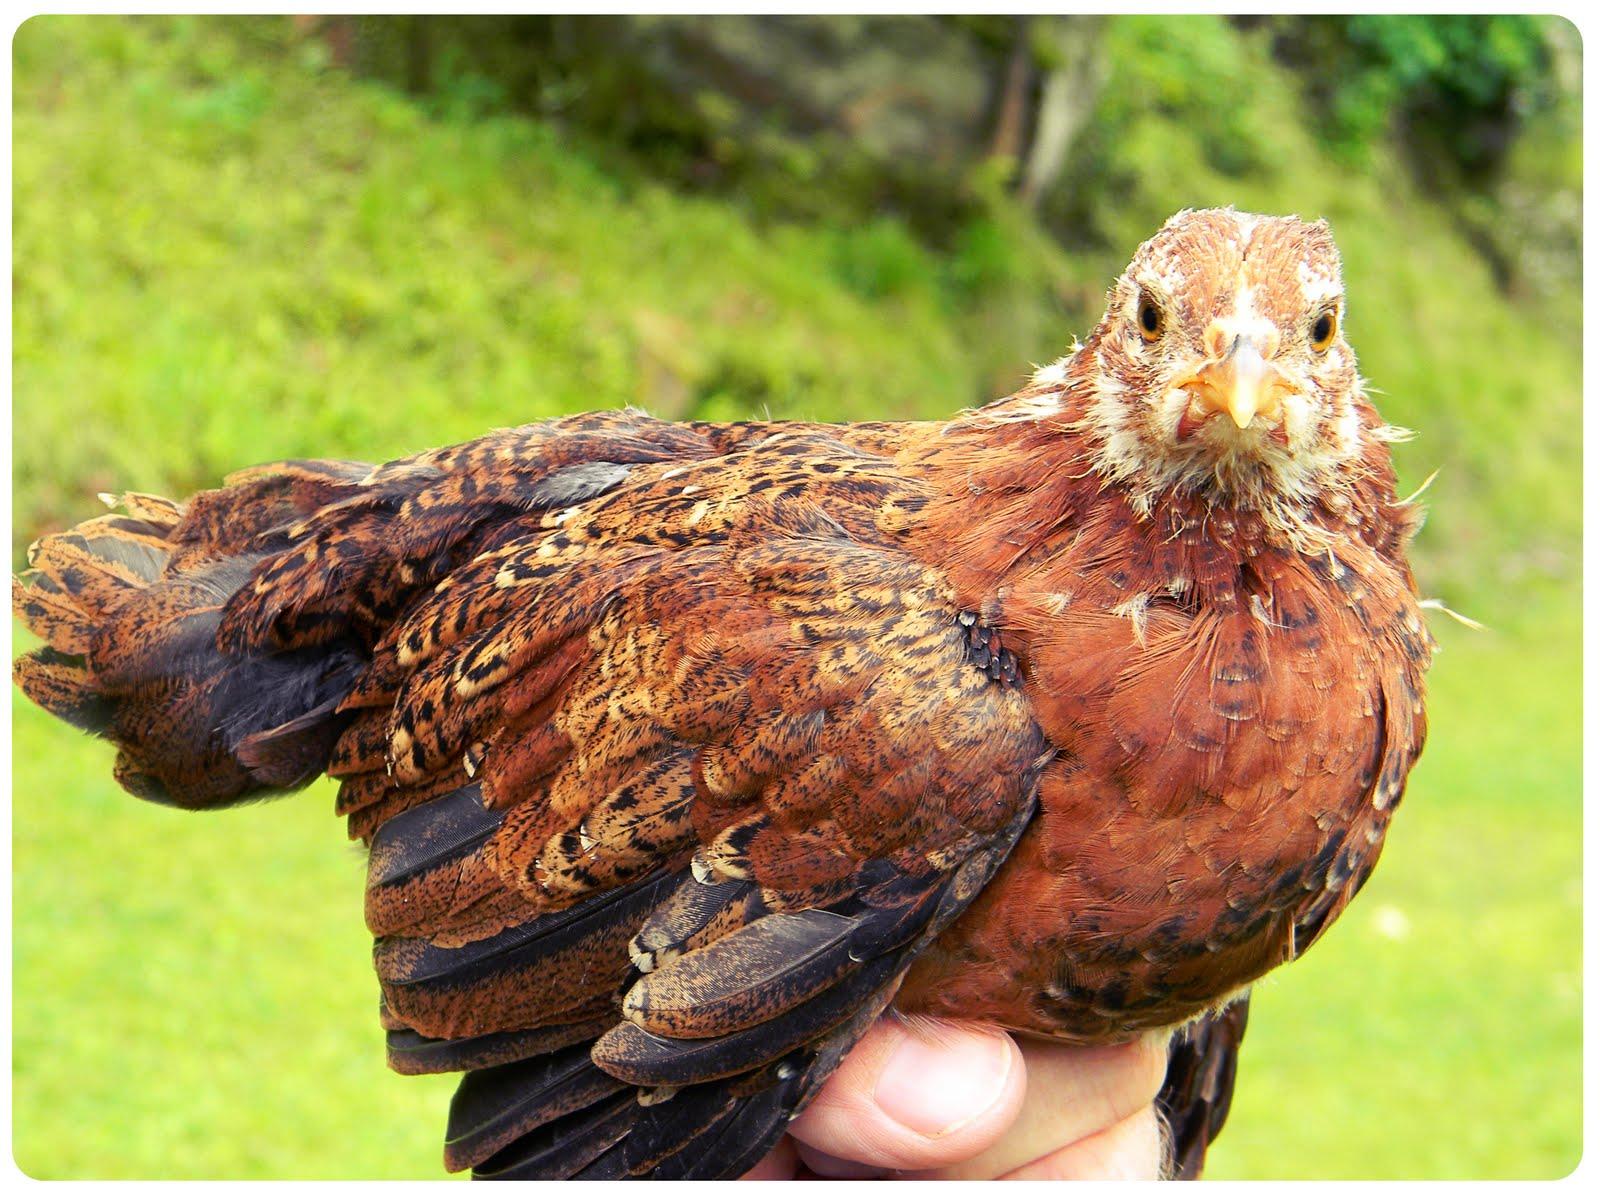 Cheap Way to Raise Chickens: FREE Chicks! | Bull Rock Barn